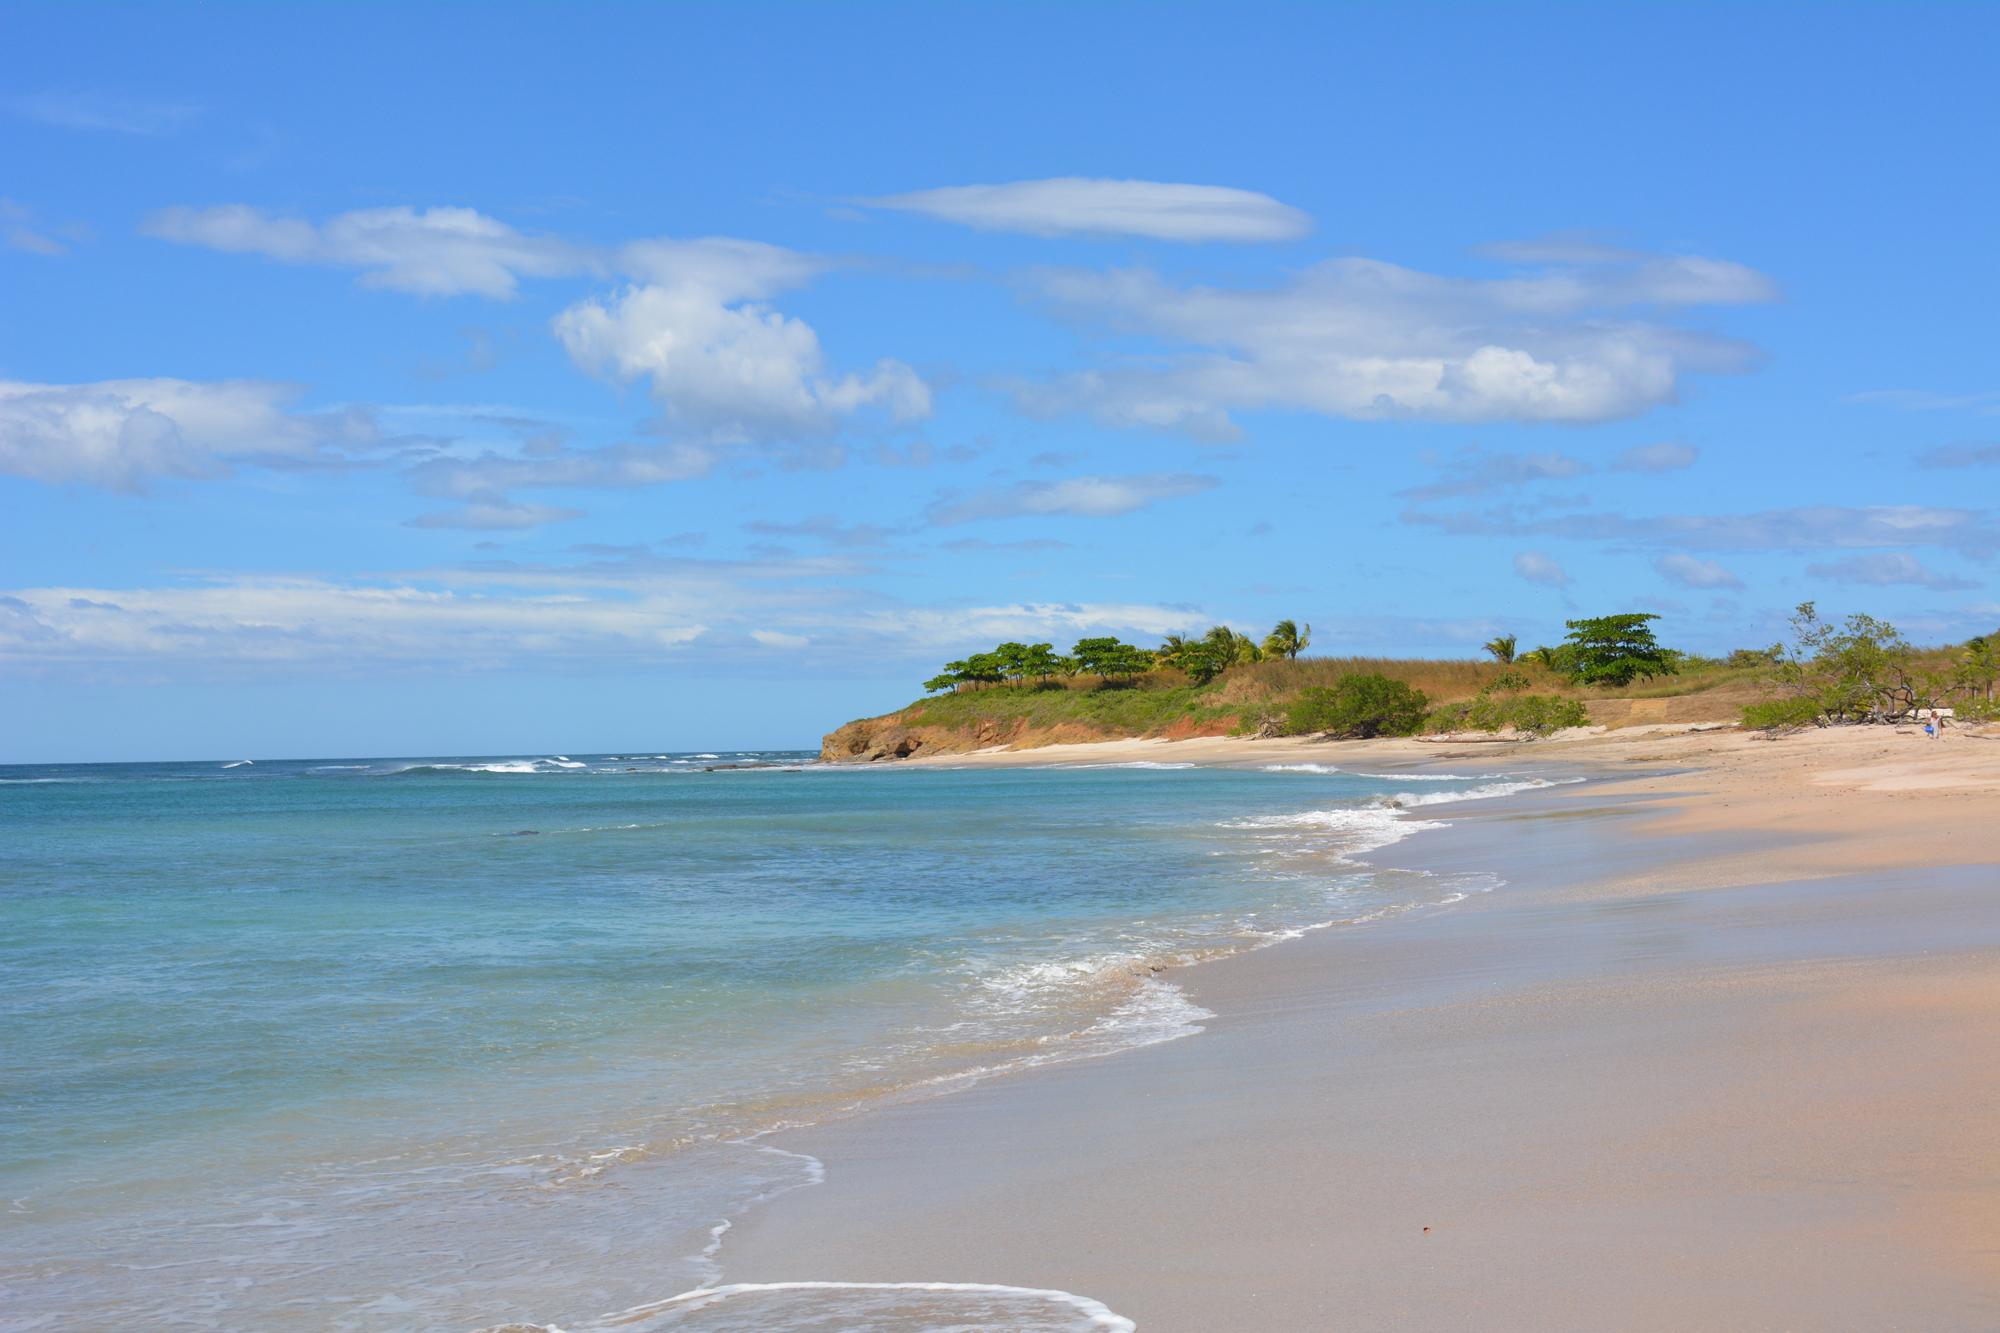 beautiful shoreline in costa rica